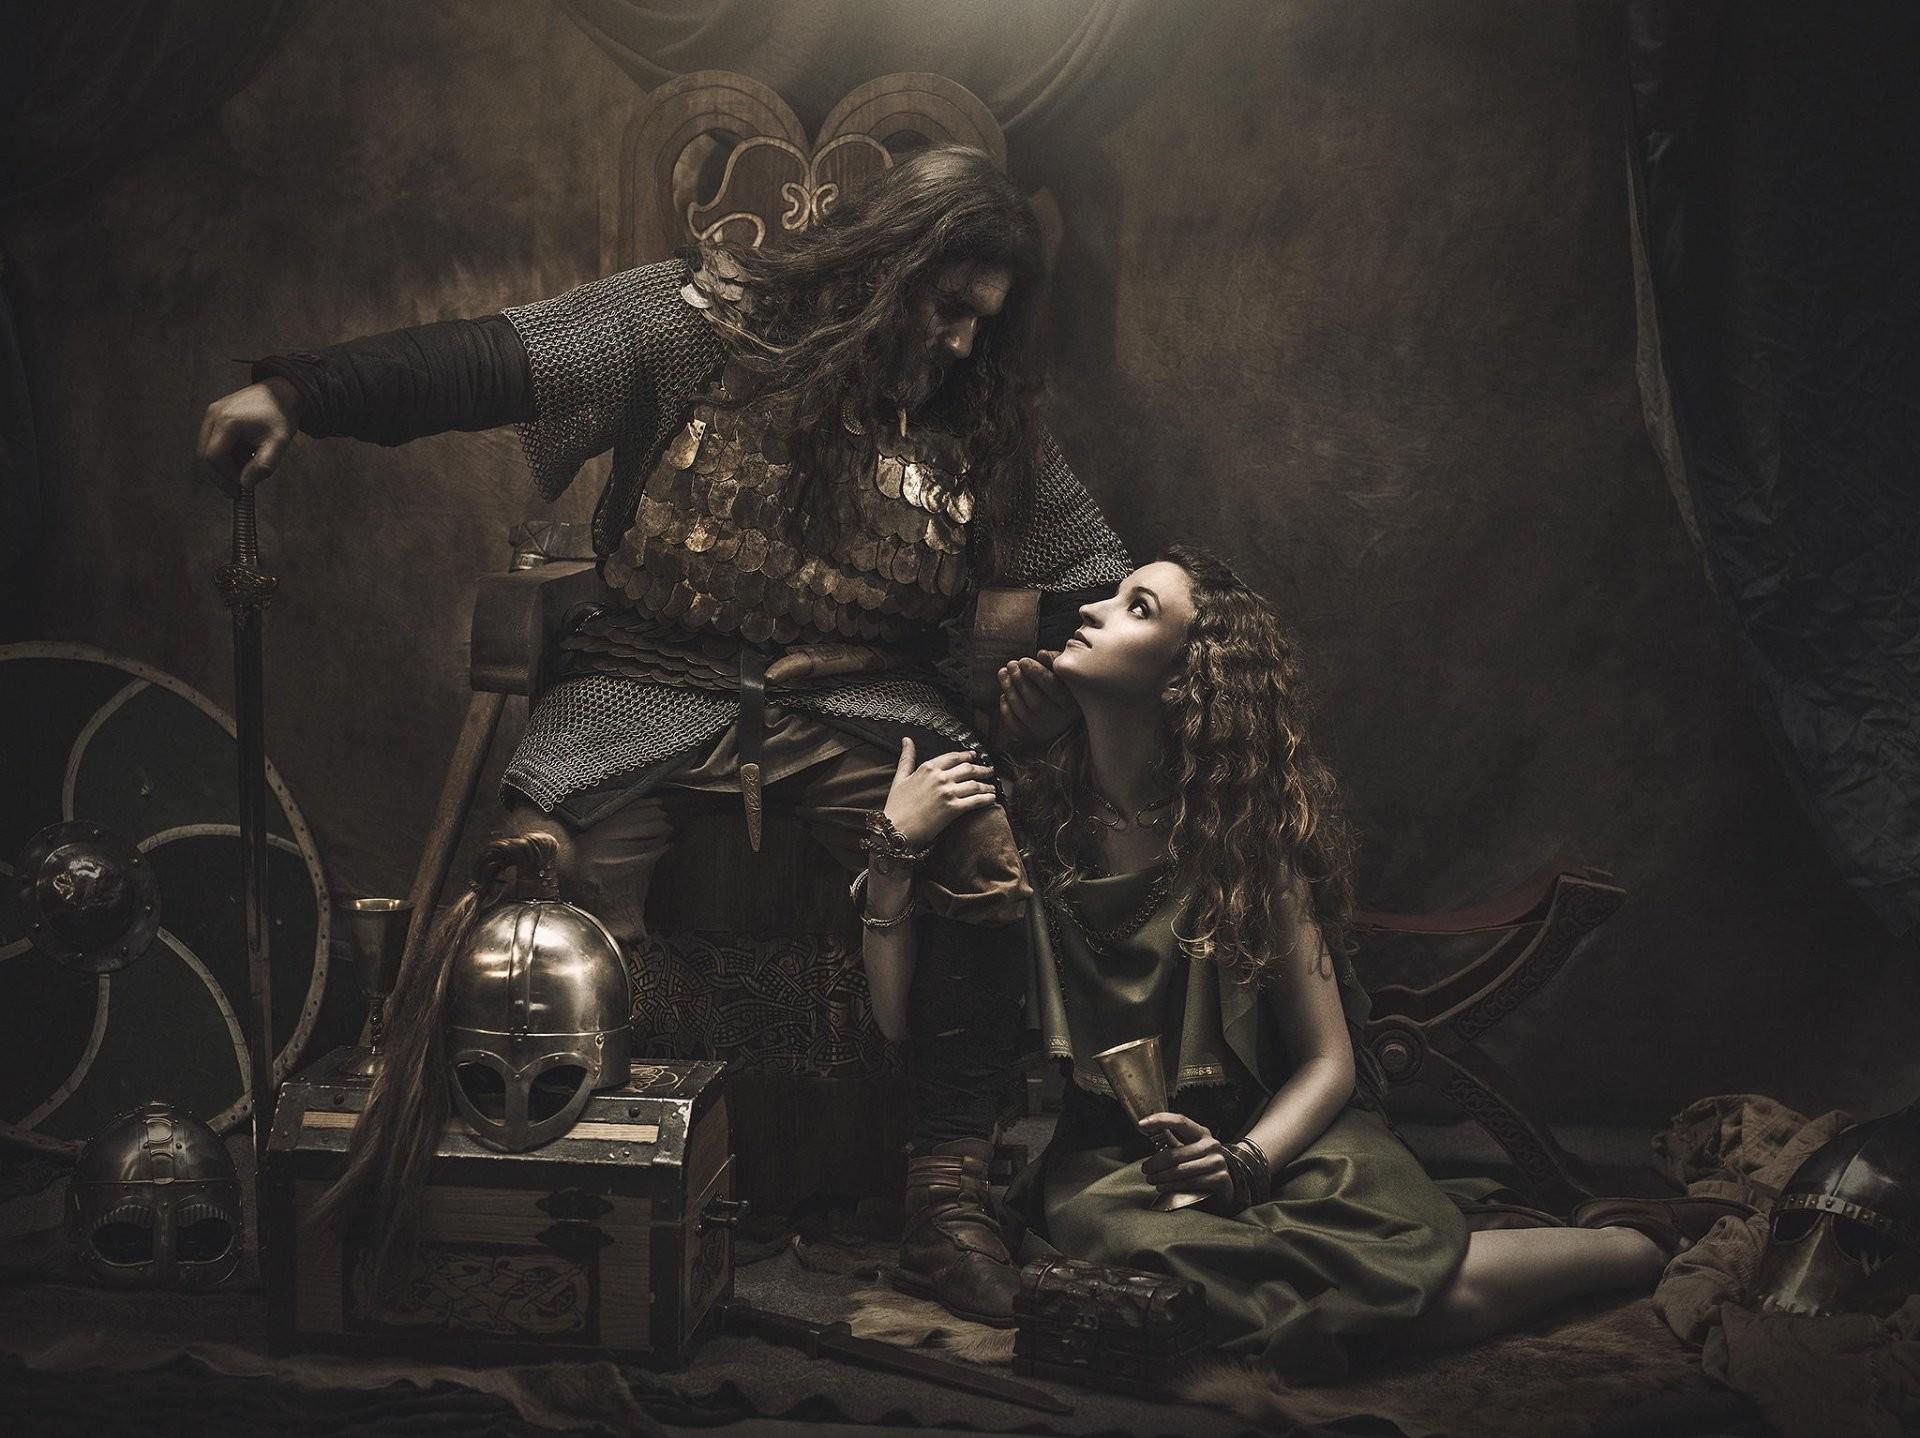 images of Viking warriors | Viking_female_warrior | viking women .